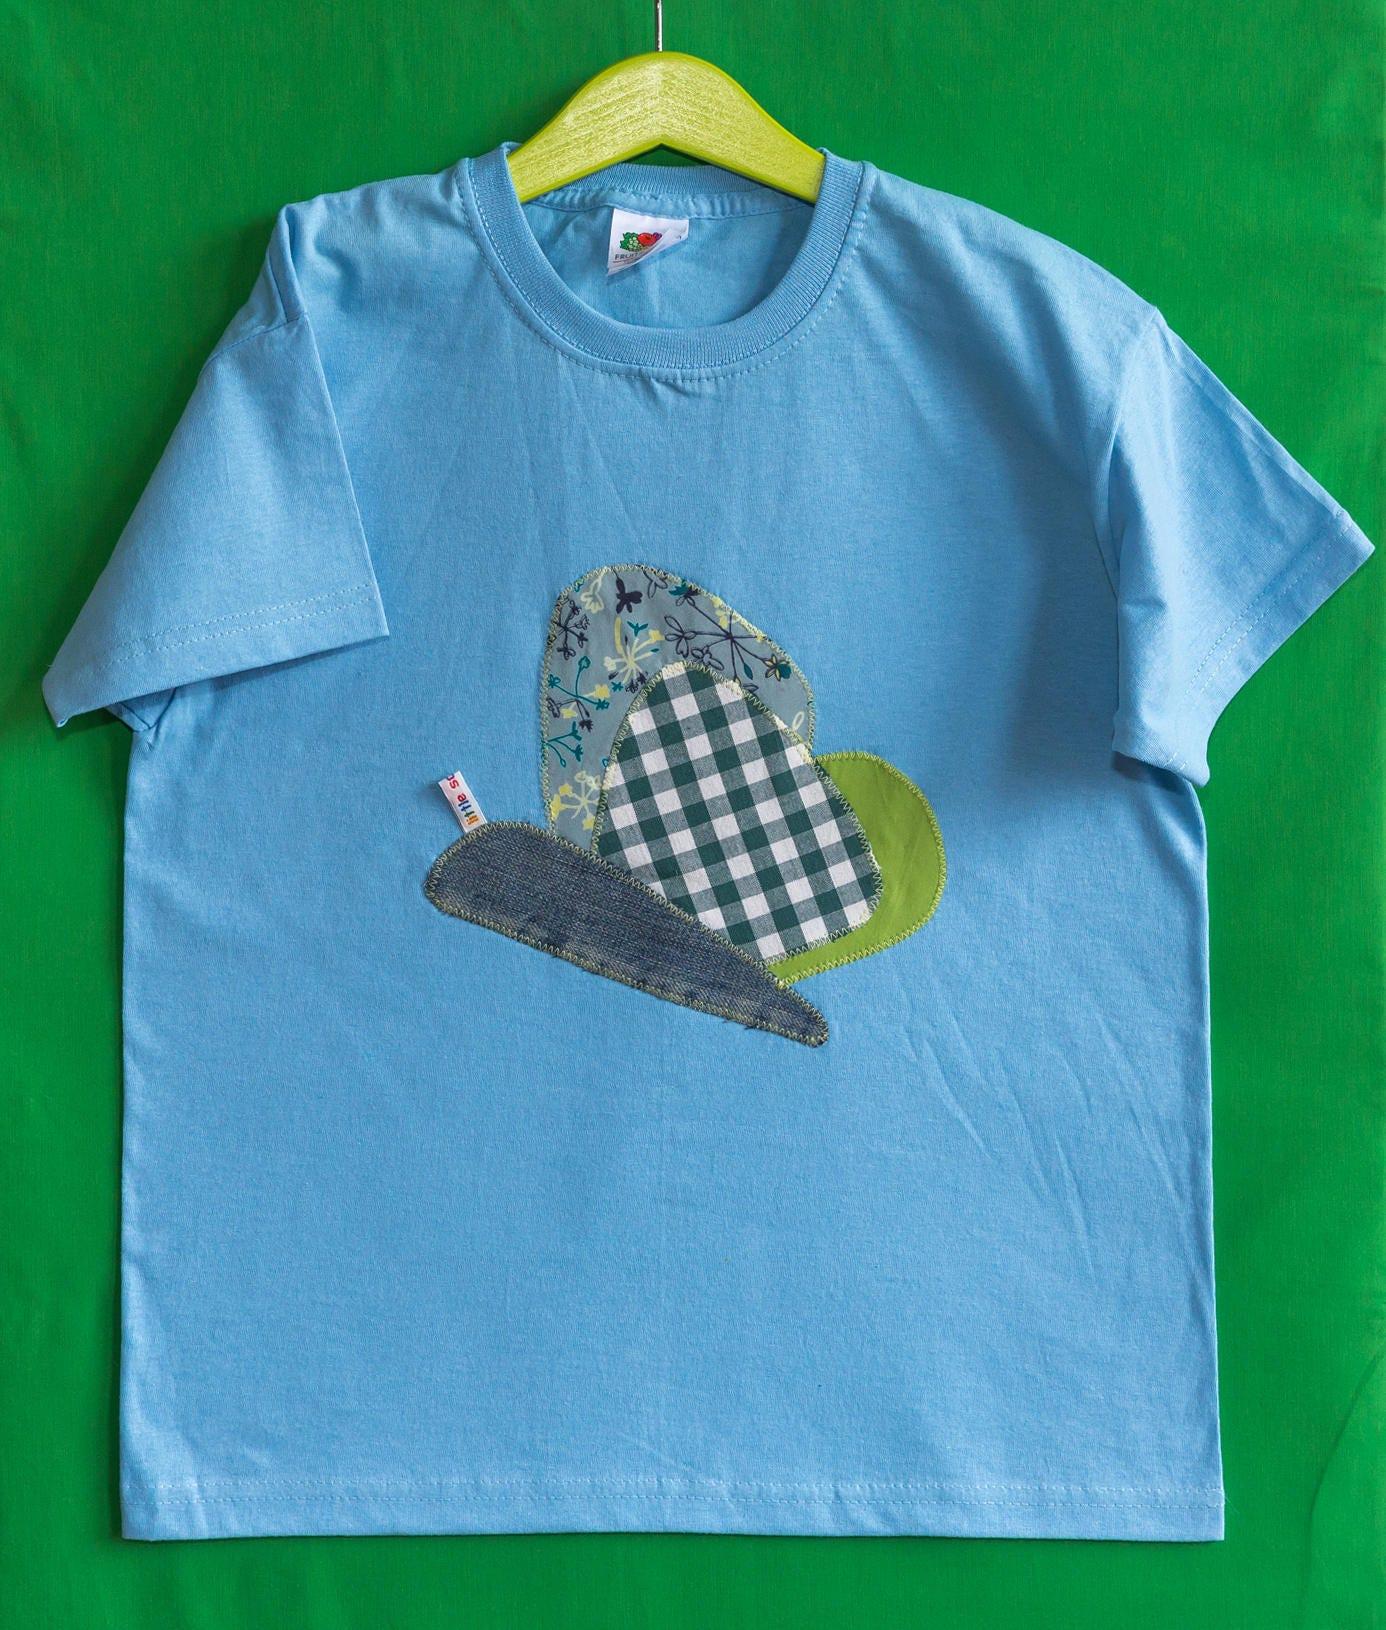 Little Sausages unique children appliqu TShirt Tshirt butterfly animal motif 100 cotton78 light blue girls kids